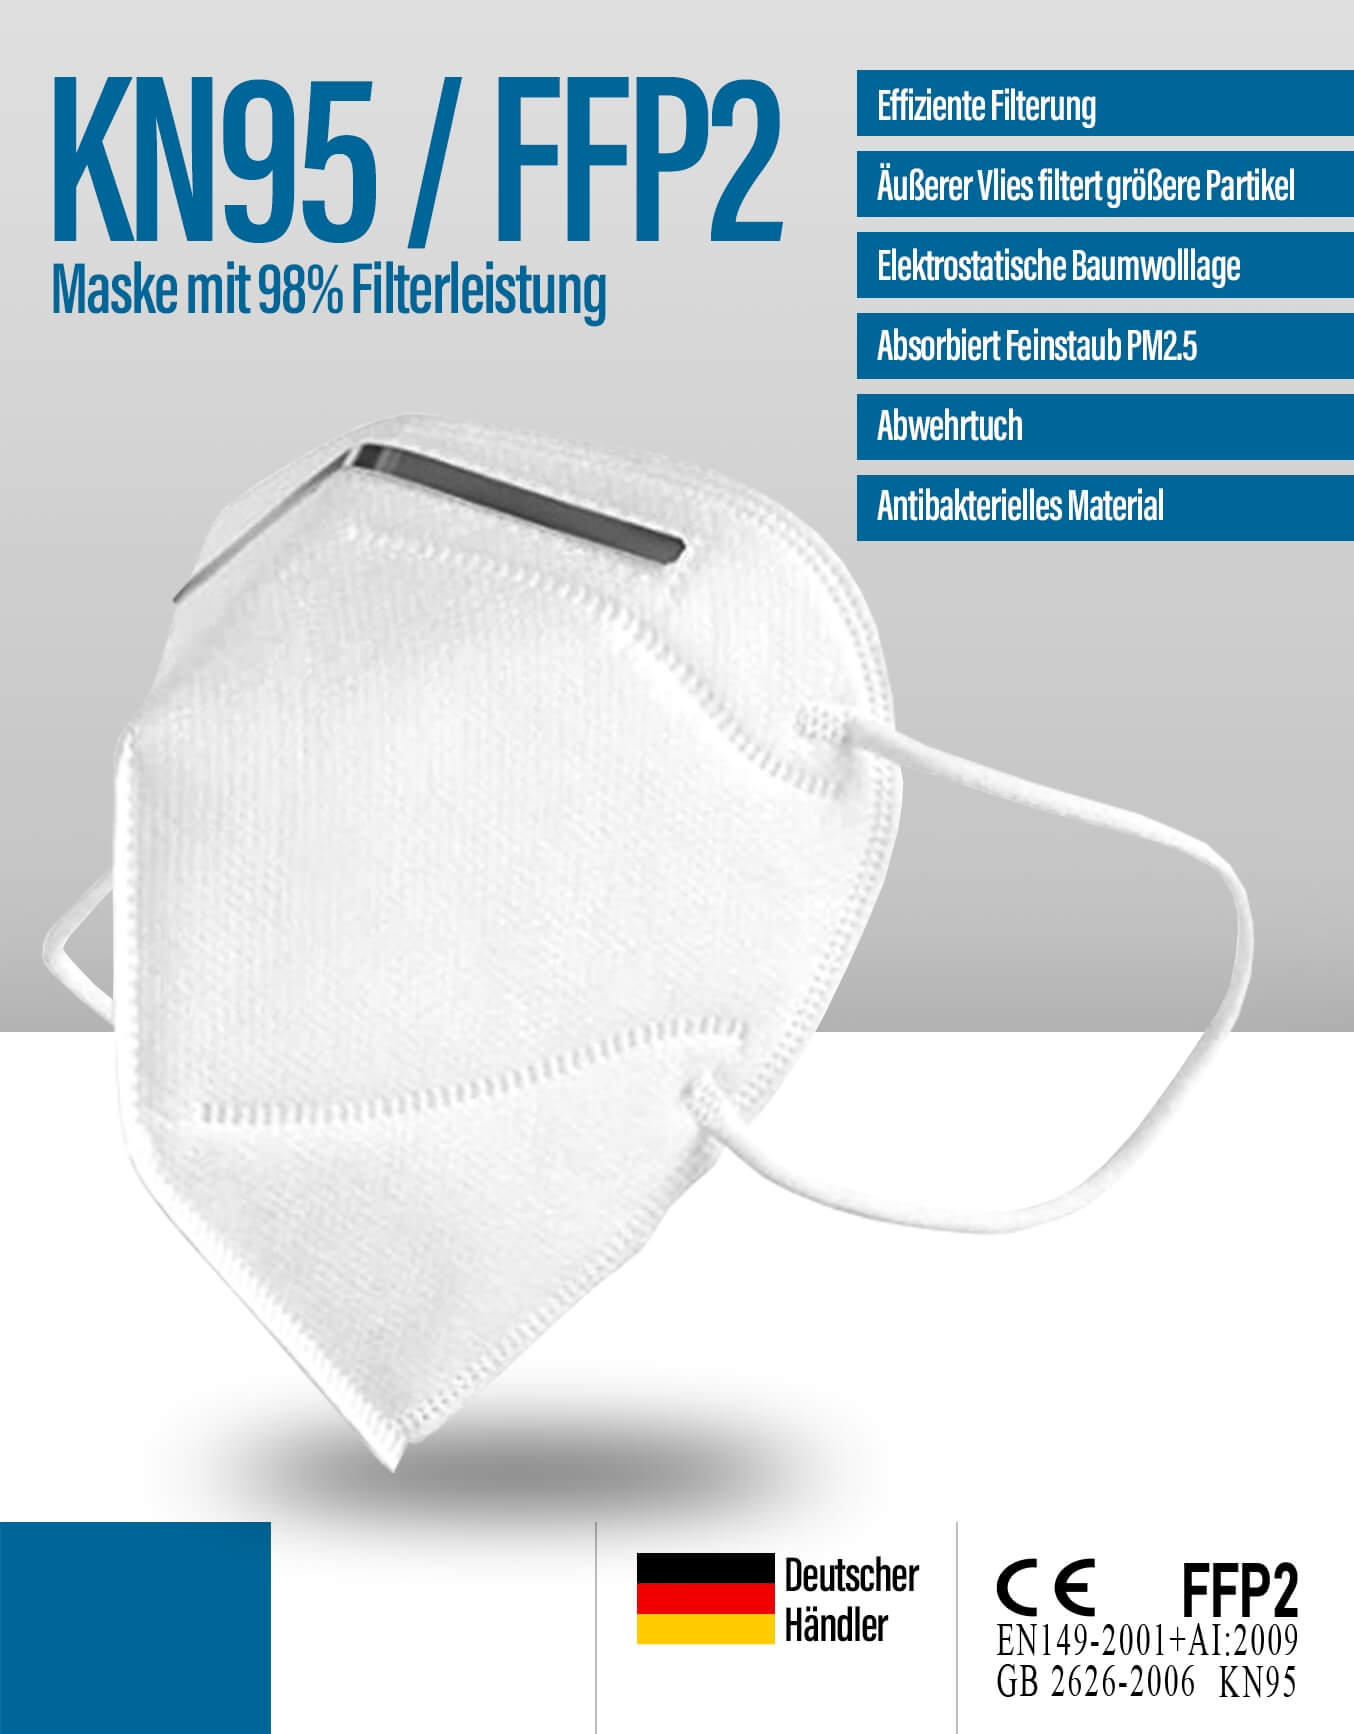 FFP2 Maske KN95 Corona Atemschutzmaske kaufen | Fatburners.at